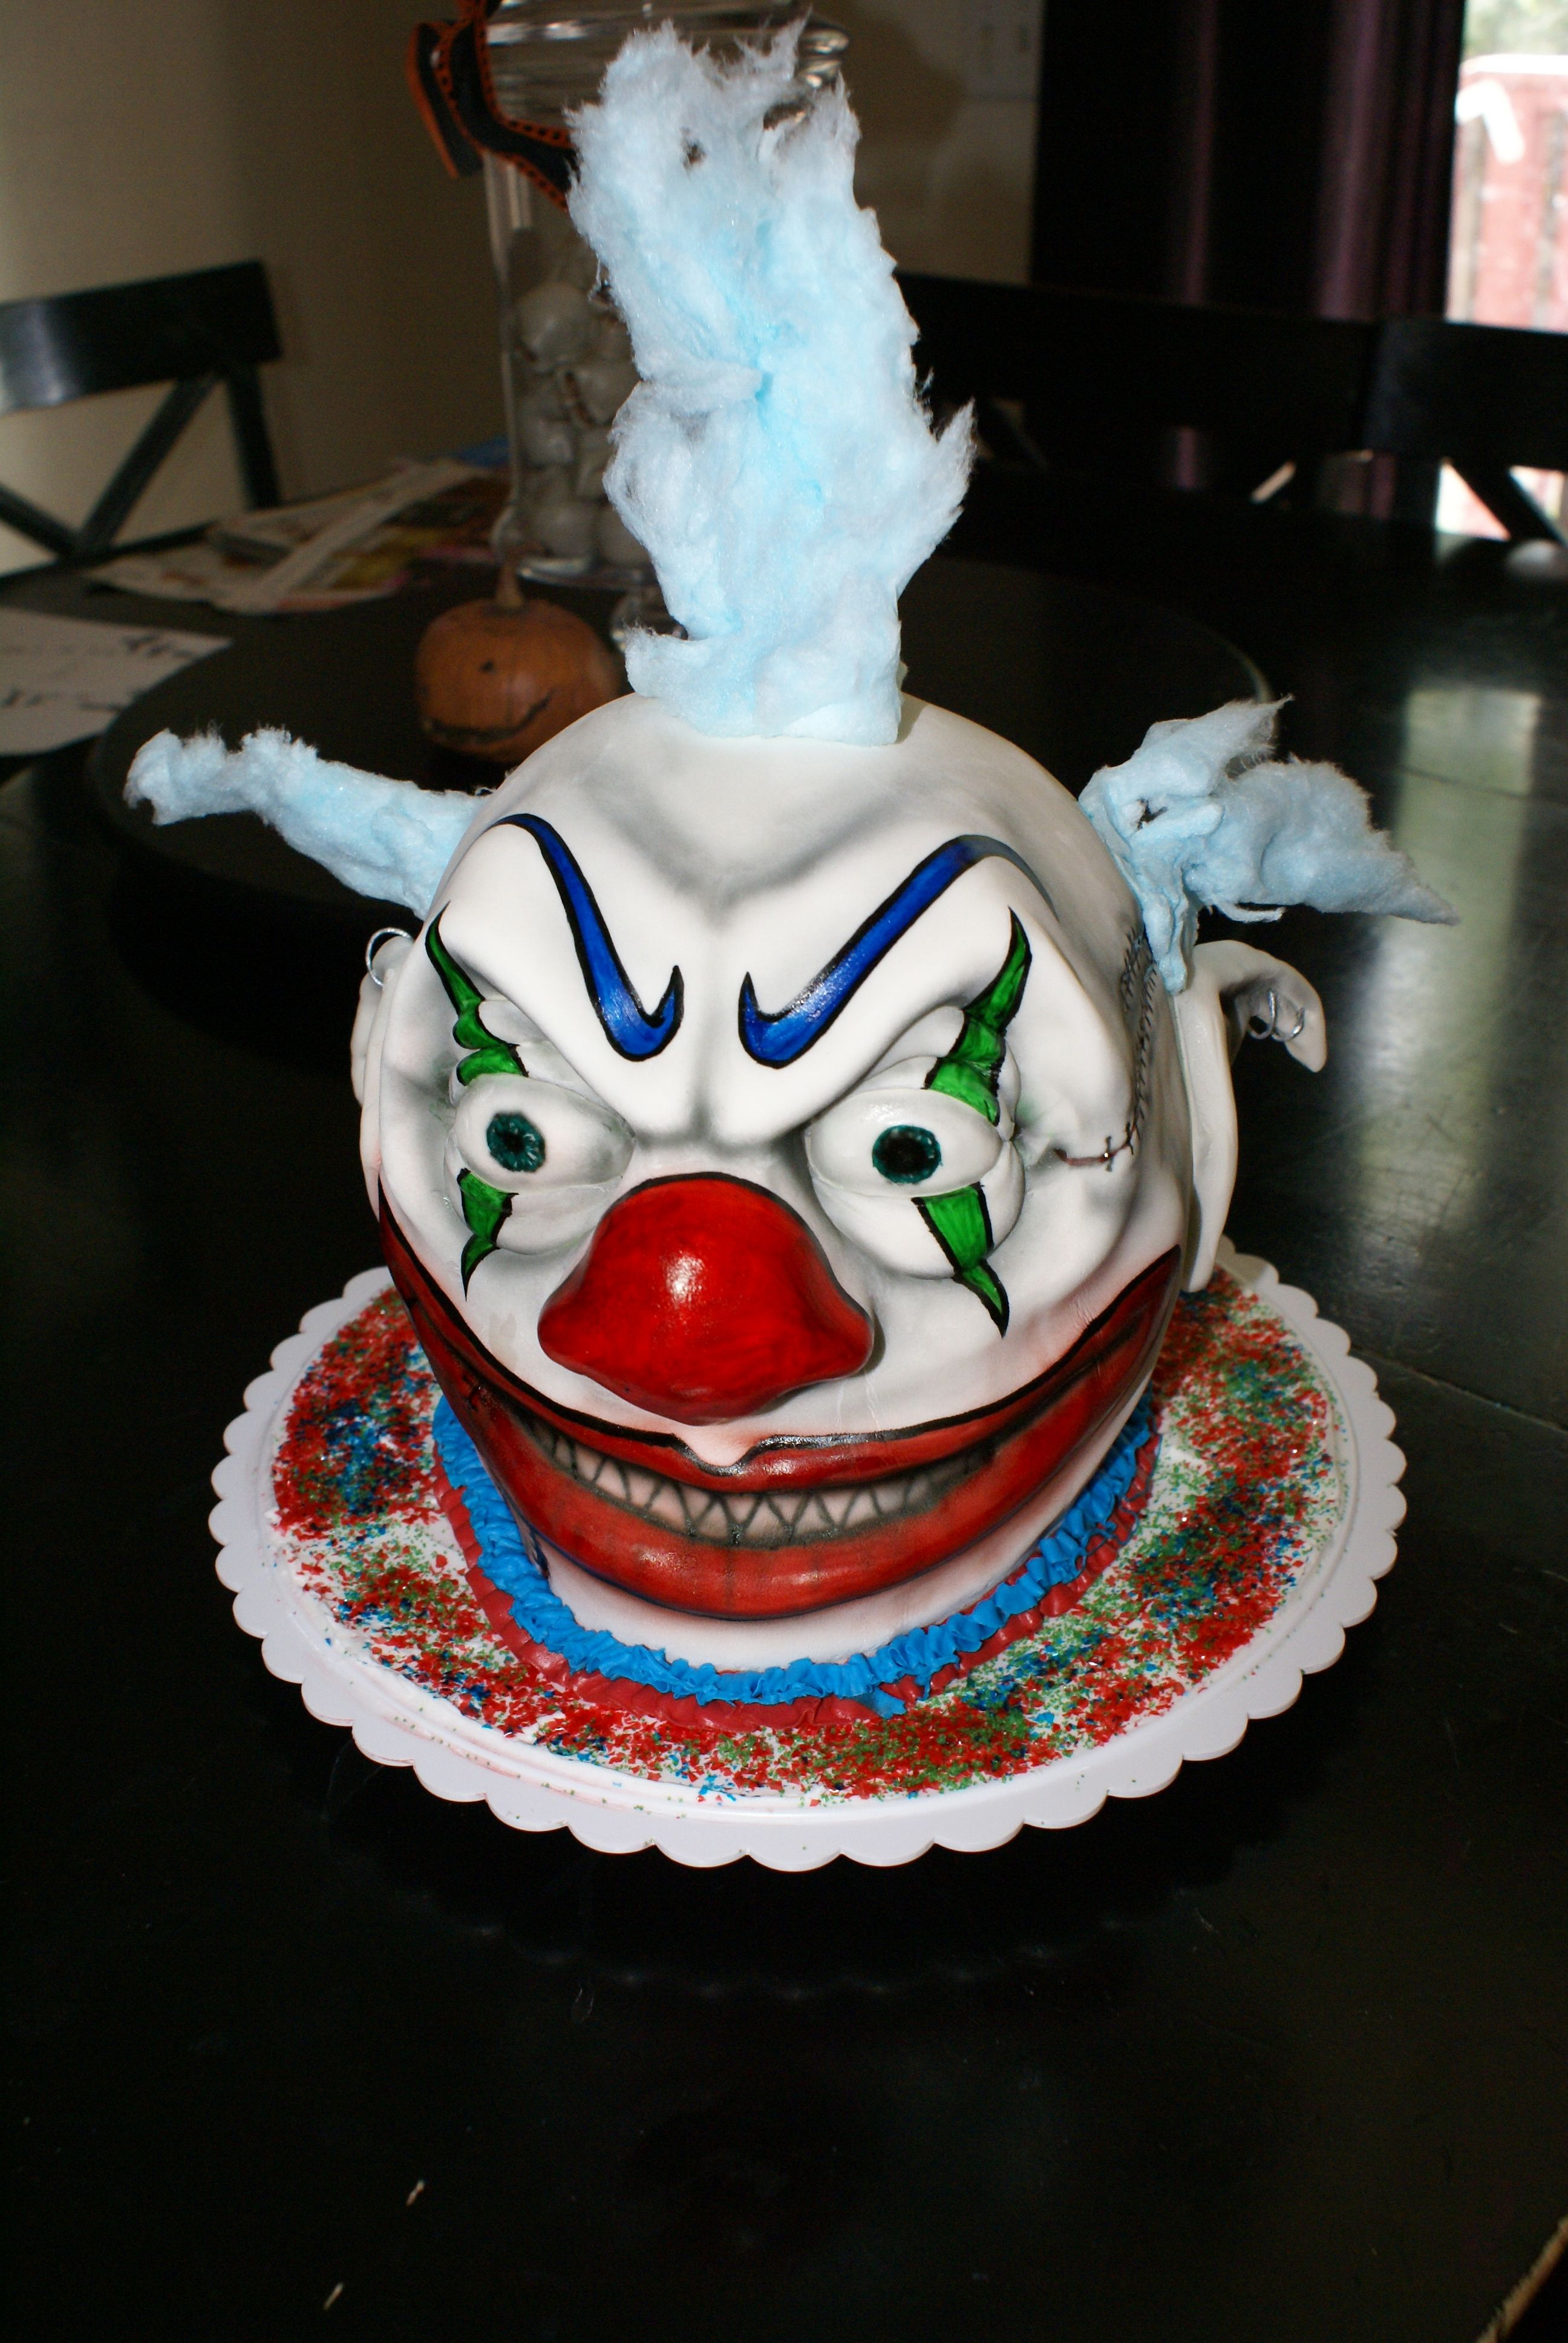 scary clown cake halloween - Scary Clown Halloween Decorations